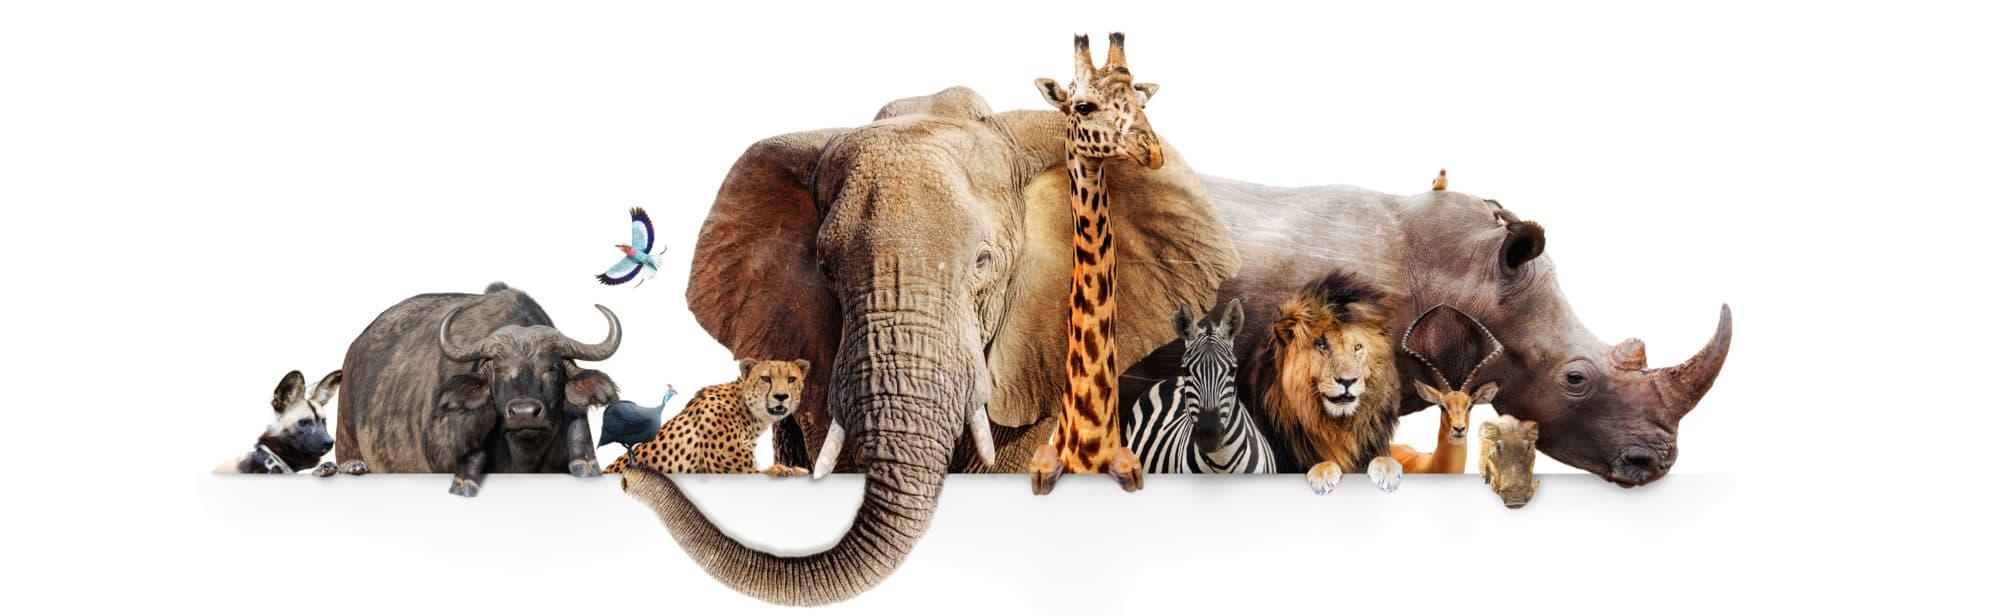 https://www.safariventures.com/wp-content/uploads/2019/02/shutterstock_760704667-2.jpg